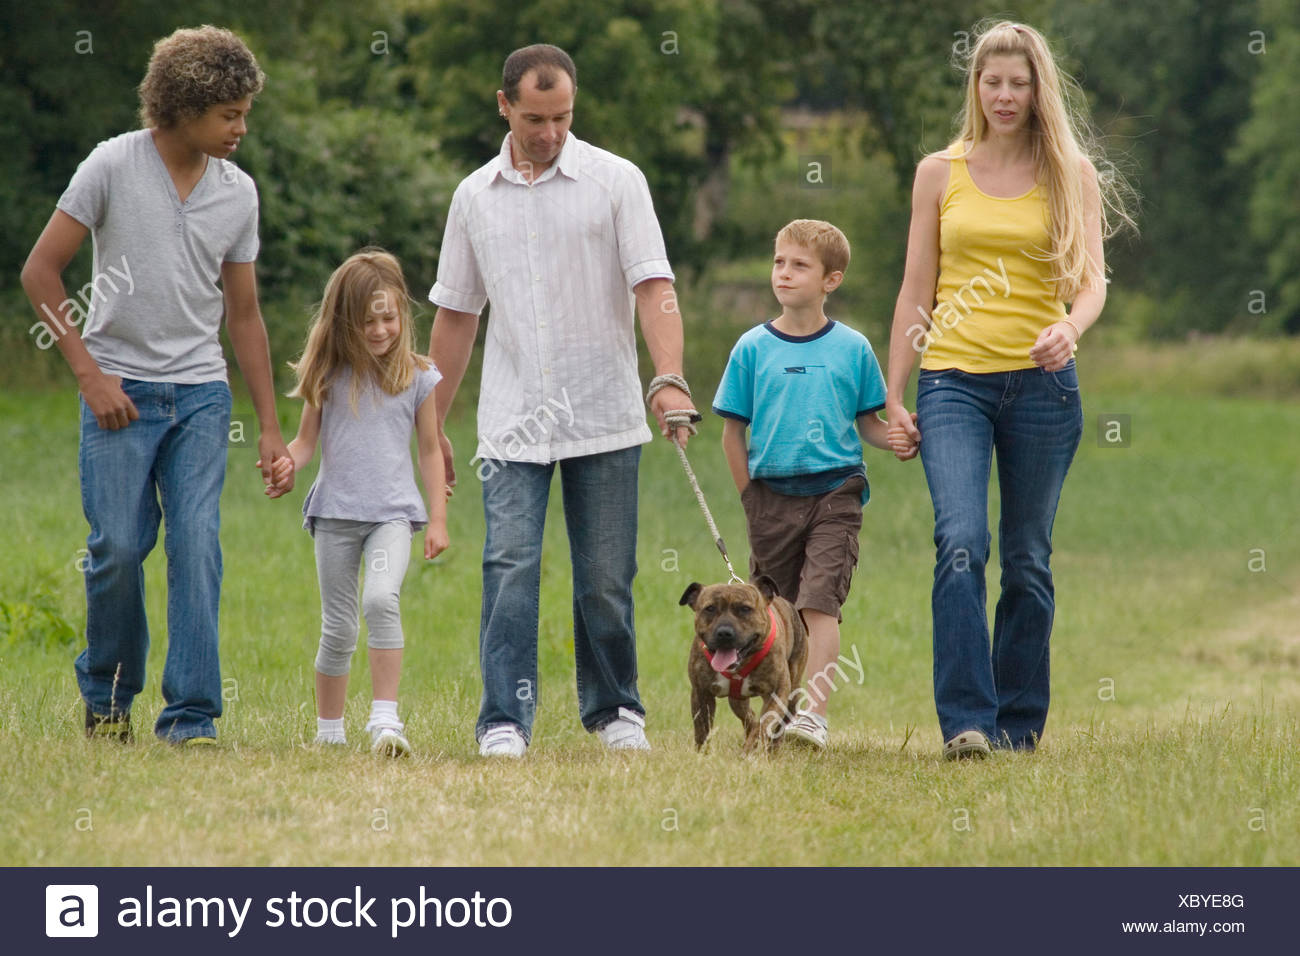 Volunteer Dog Walking Liverpool